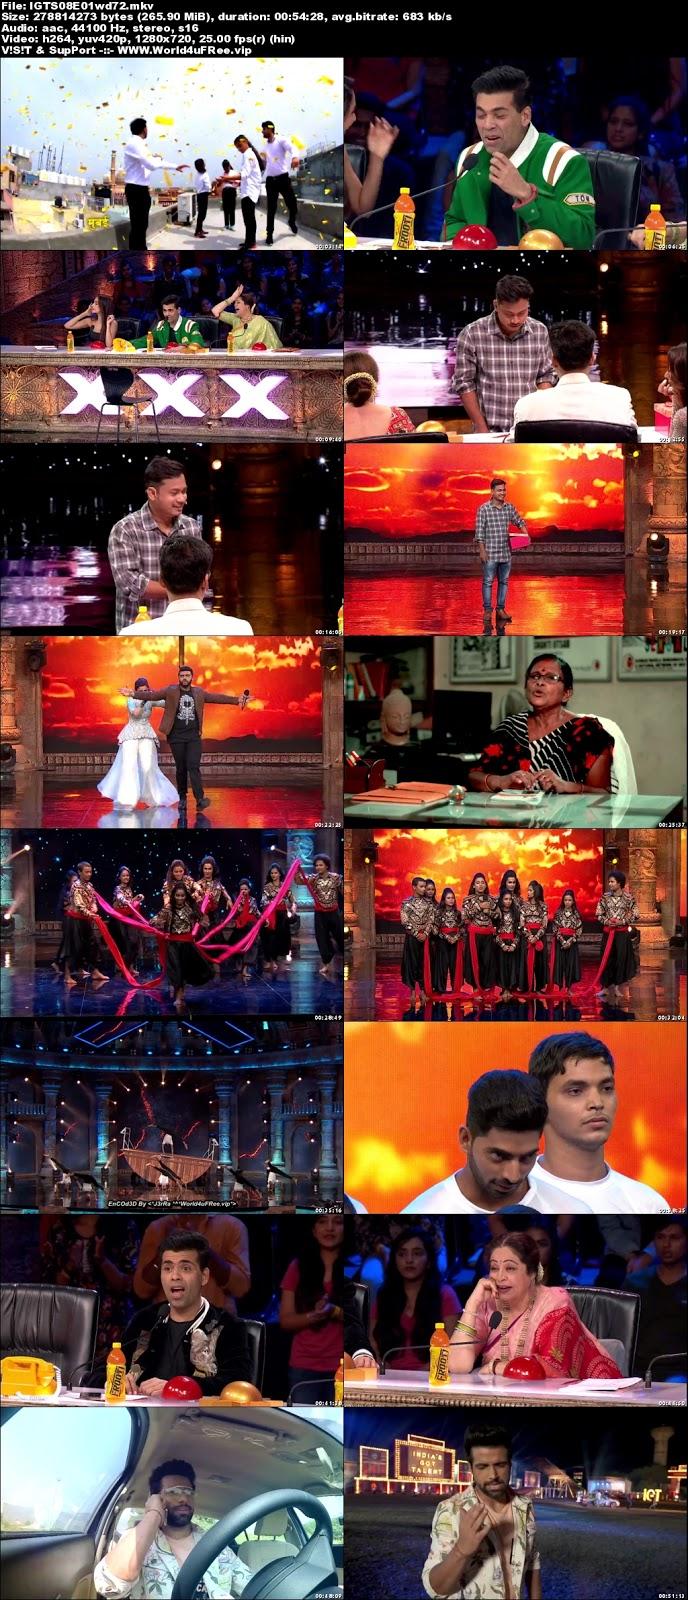 India's Got Talent S08 Episode 01 720p WEBRip 250mb x264 world4ufree.funtv show India's Got Talent Season 8 Star Plus tv show HD 720p free download or watch online at world4ufree.fun